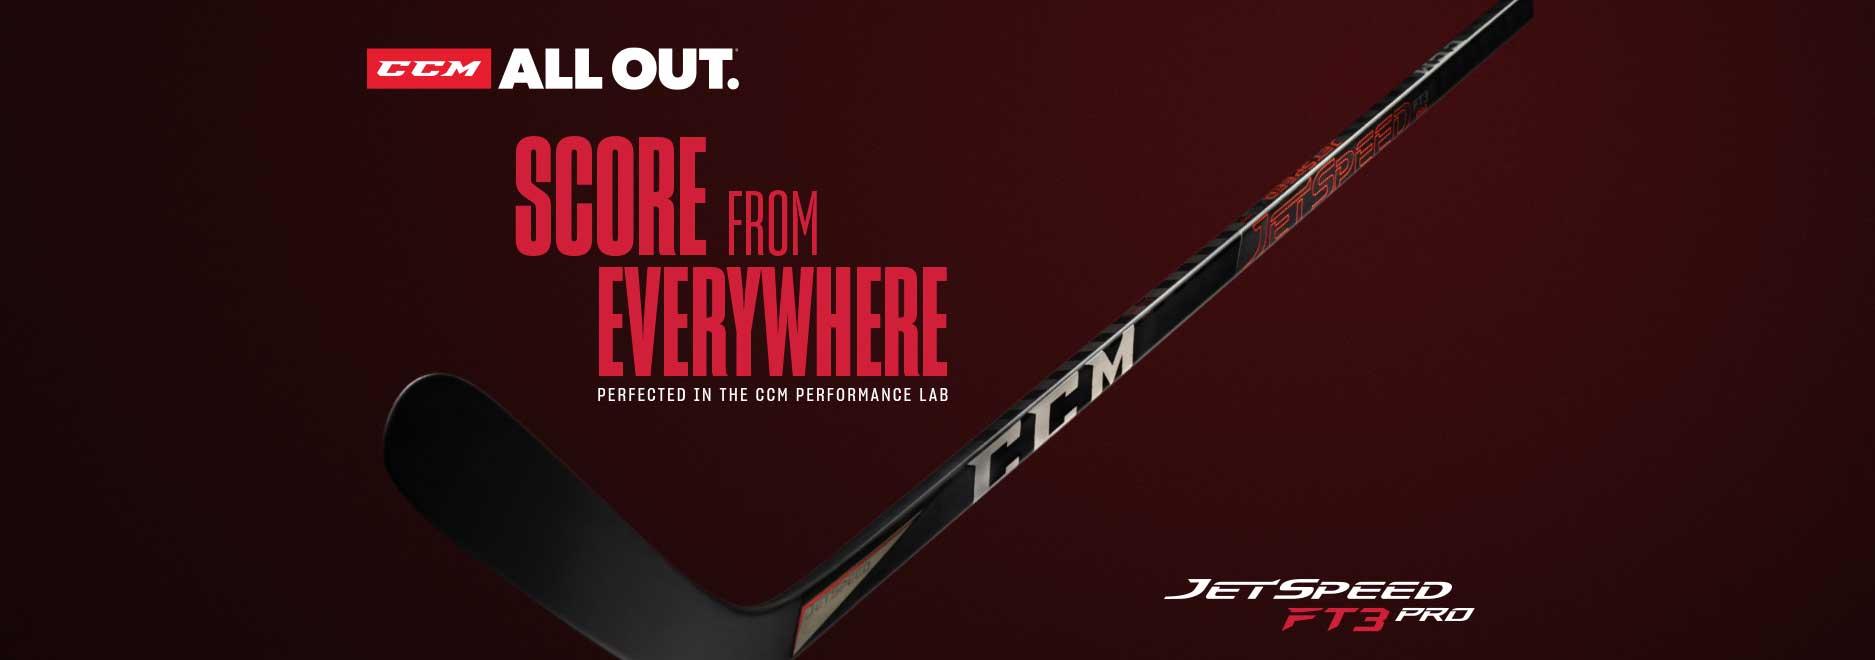 CCM JetSpeed FT3 Pro Hockey Sticks